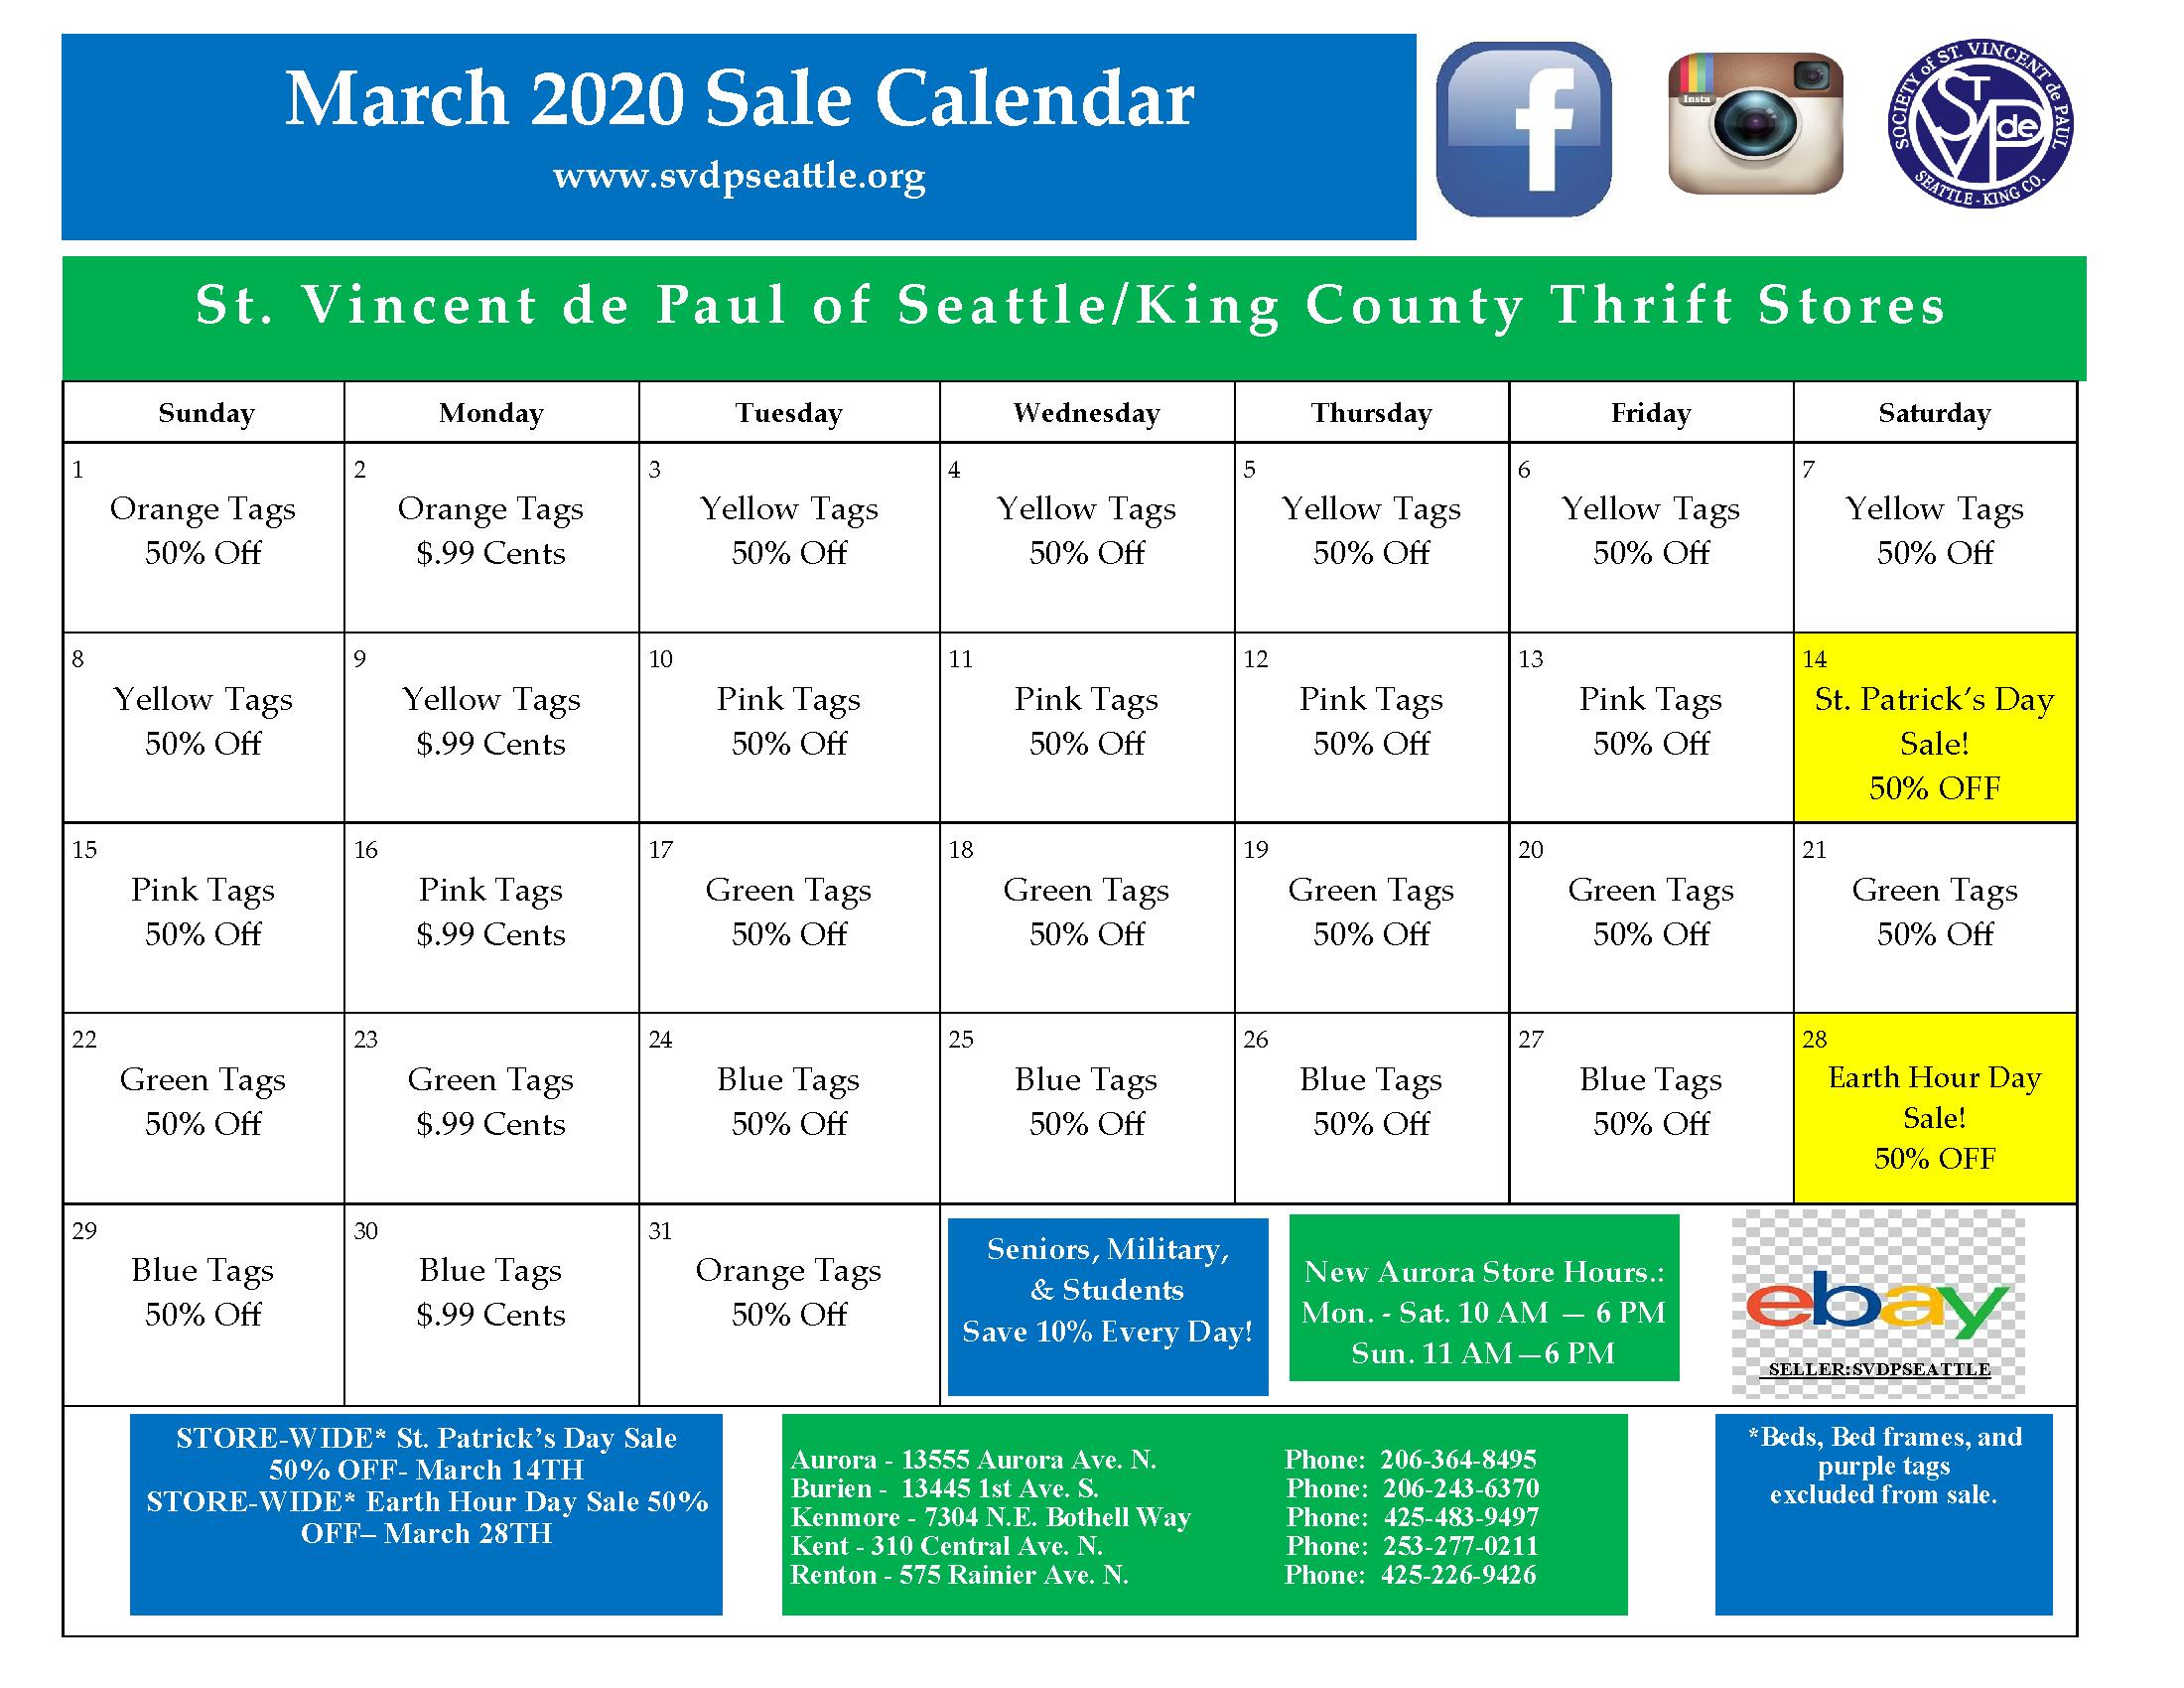 March 2020 Calendar-Ebay Link 2-28-20